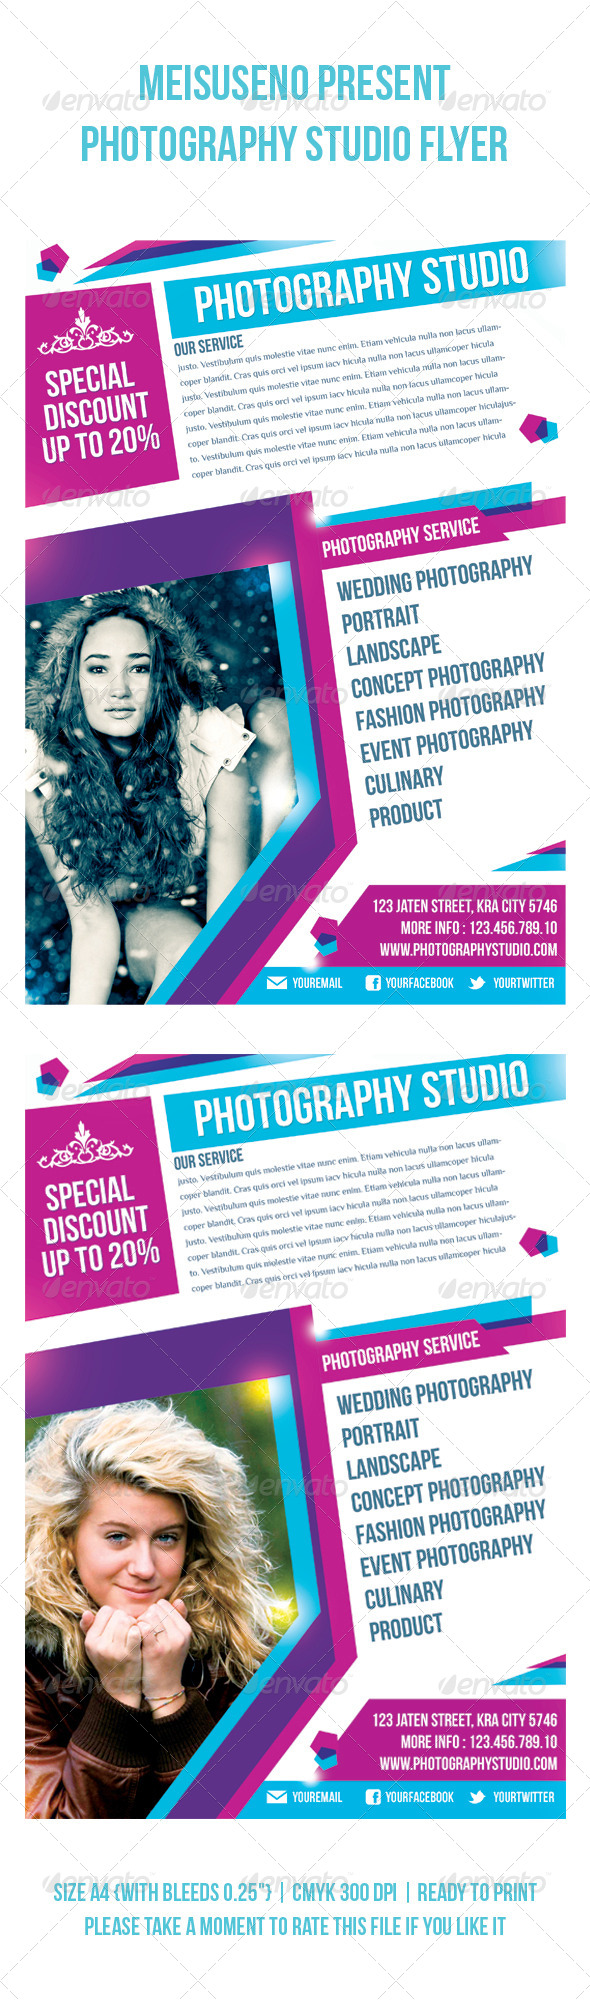 GraphicRiver Photography Studio Flyer 4040539